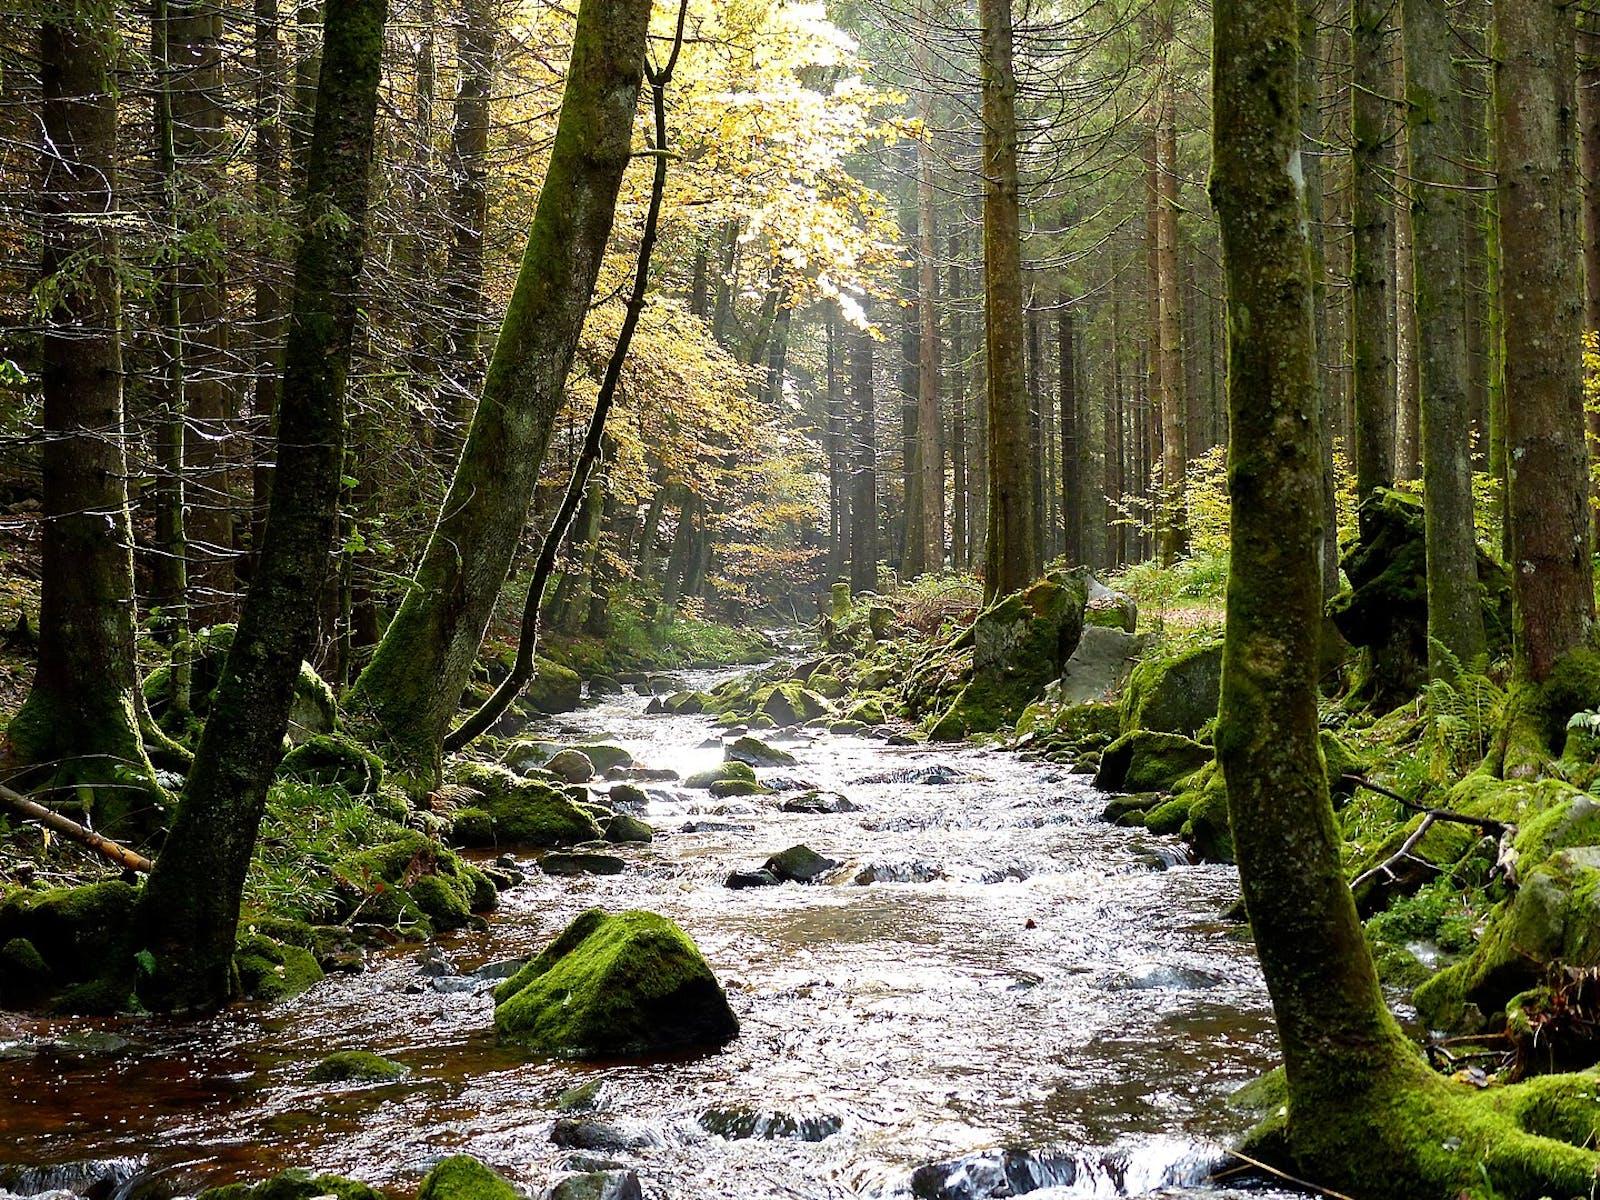 Western European Broadleaf Forests